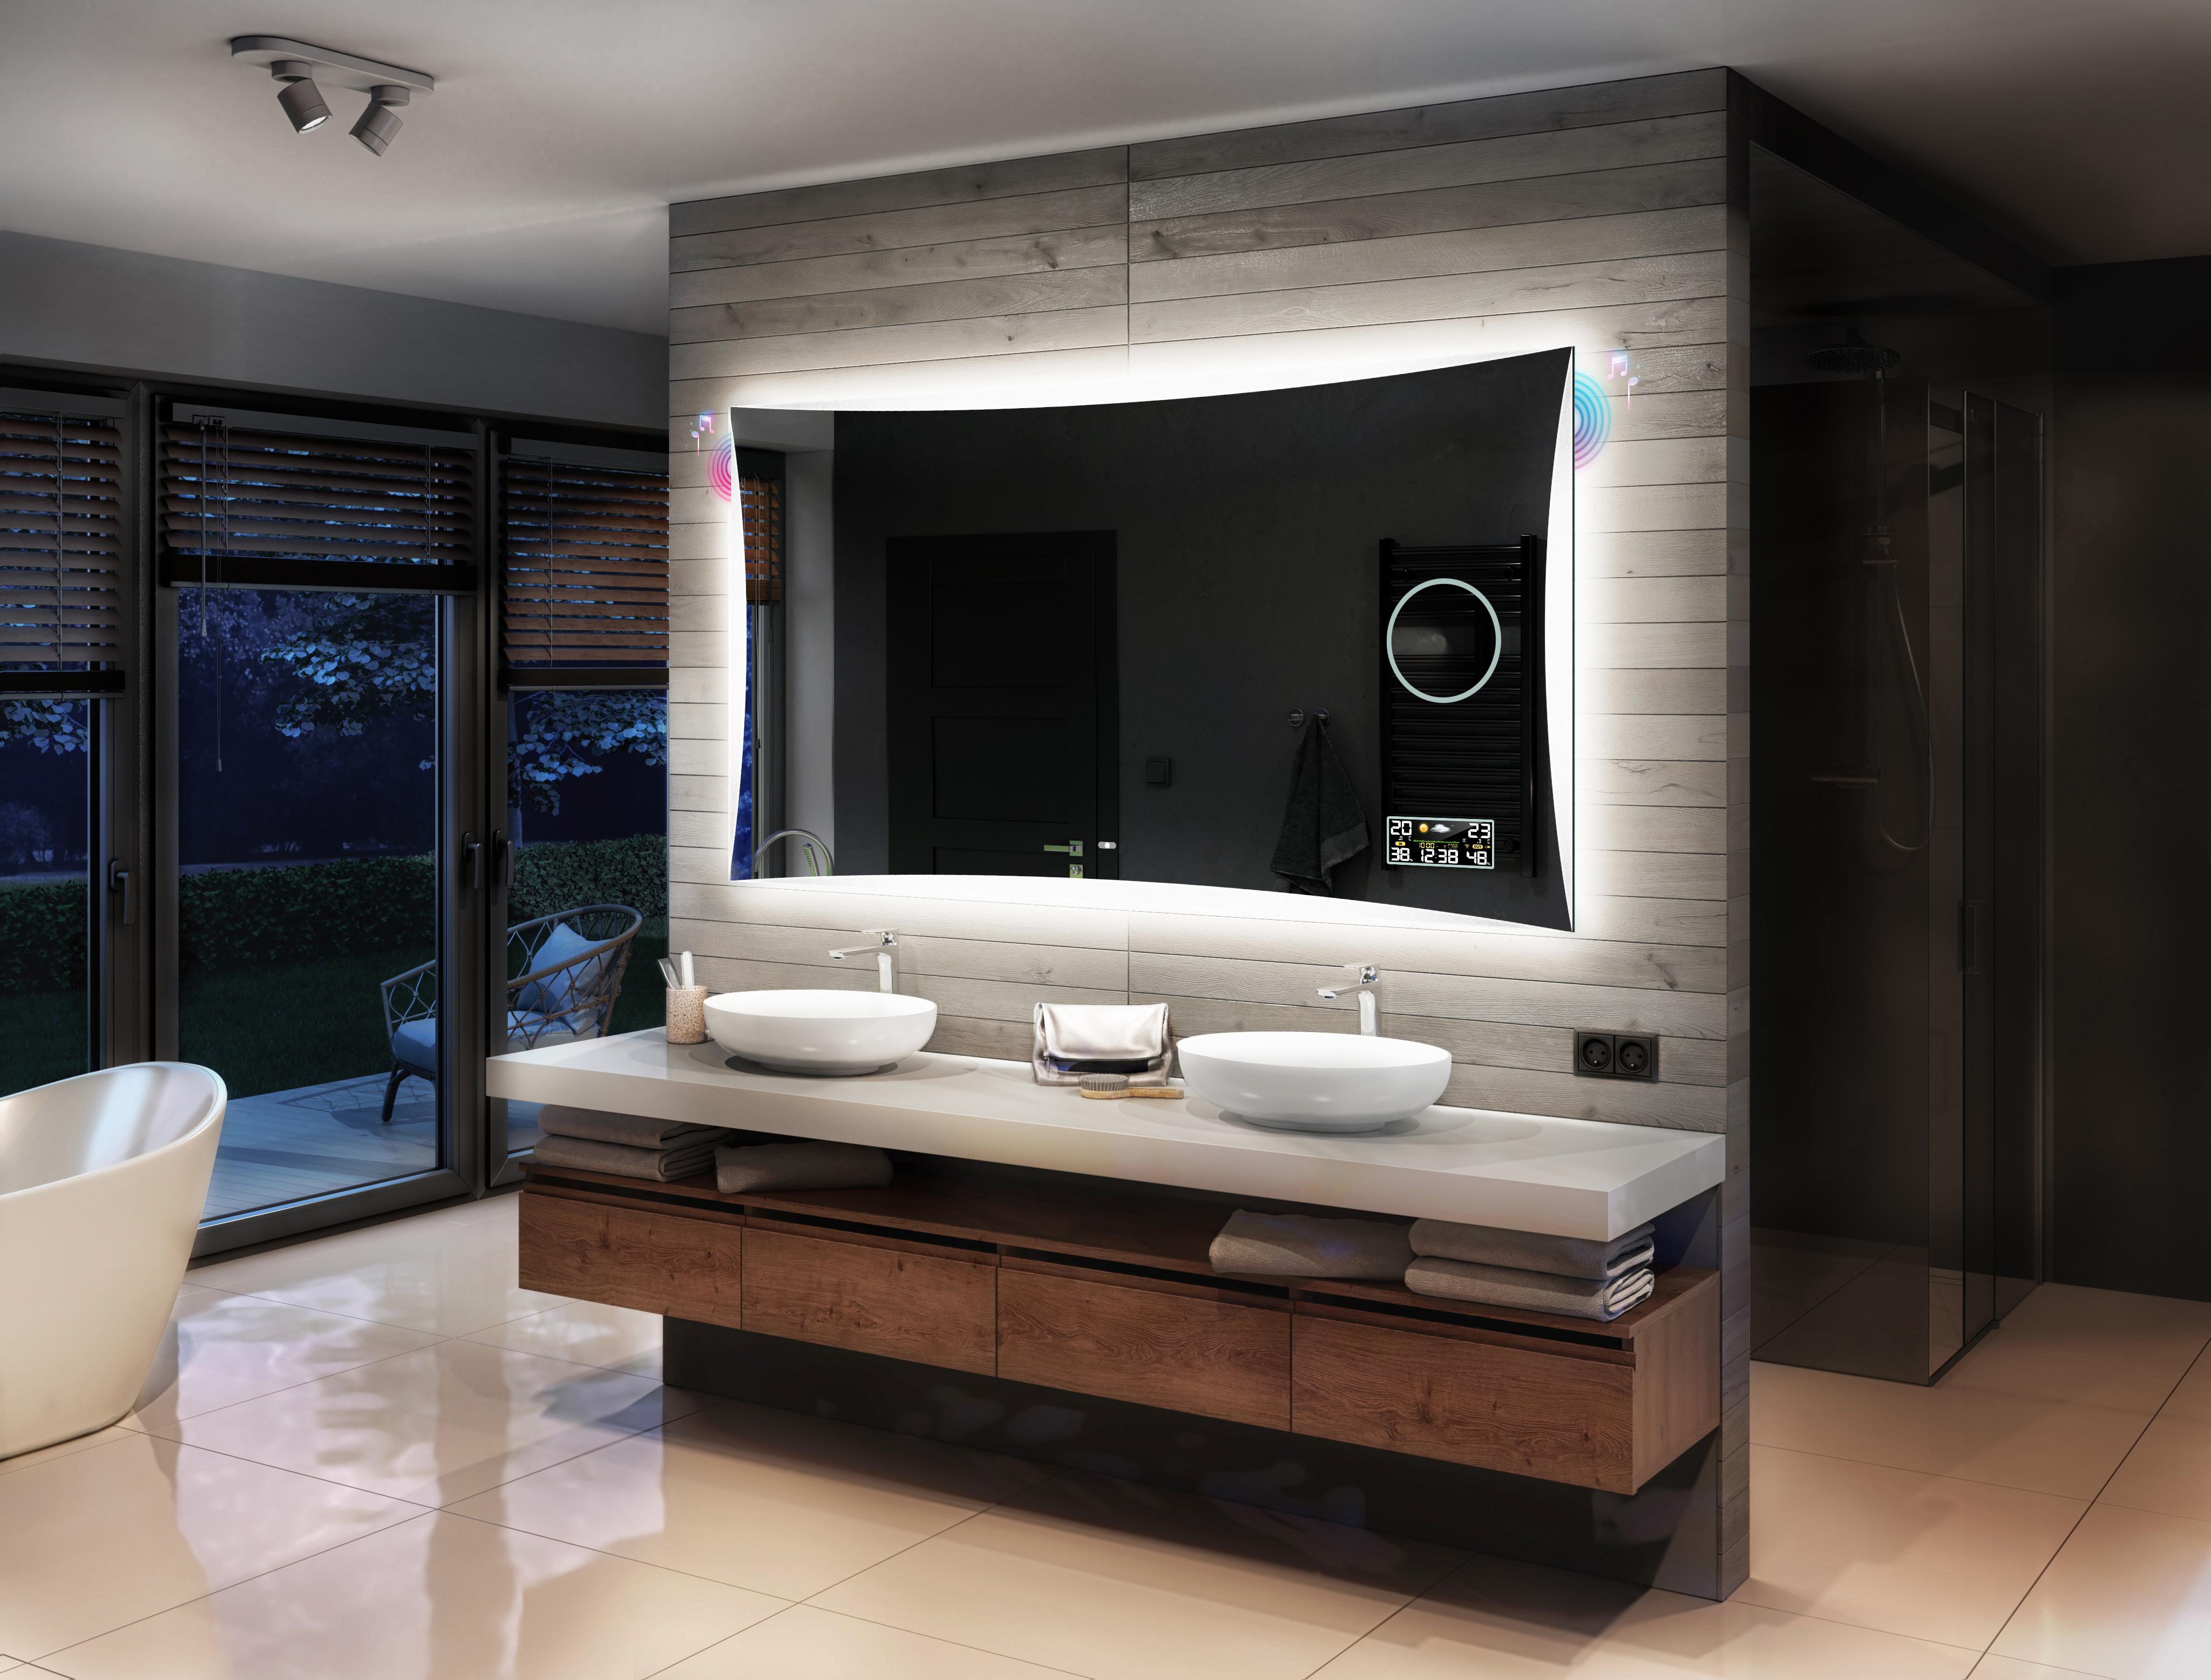 Badspiegel mit LED Beleuchtung SCHALTER MAKEUP SPIEGEL HEIZMATTE LED UHR L77